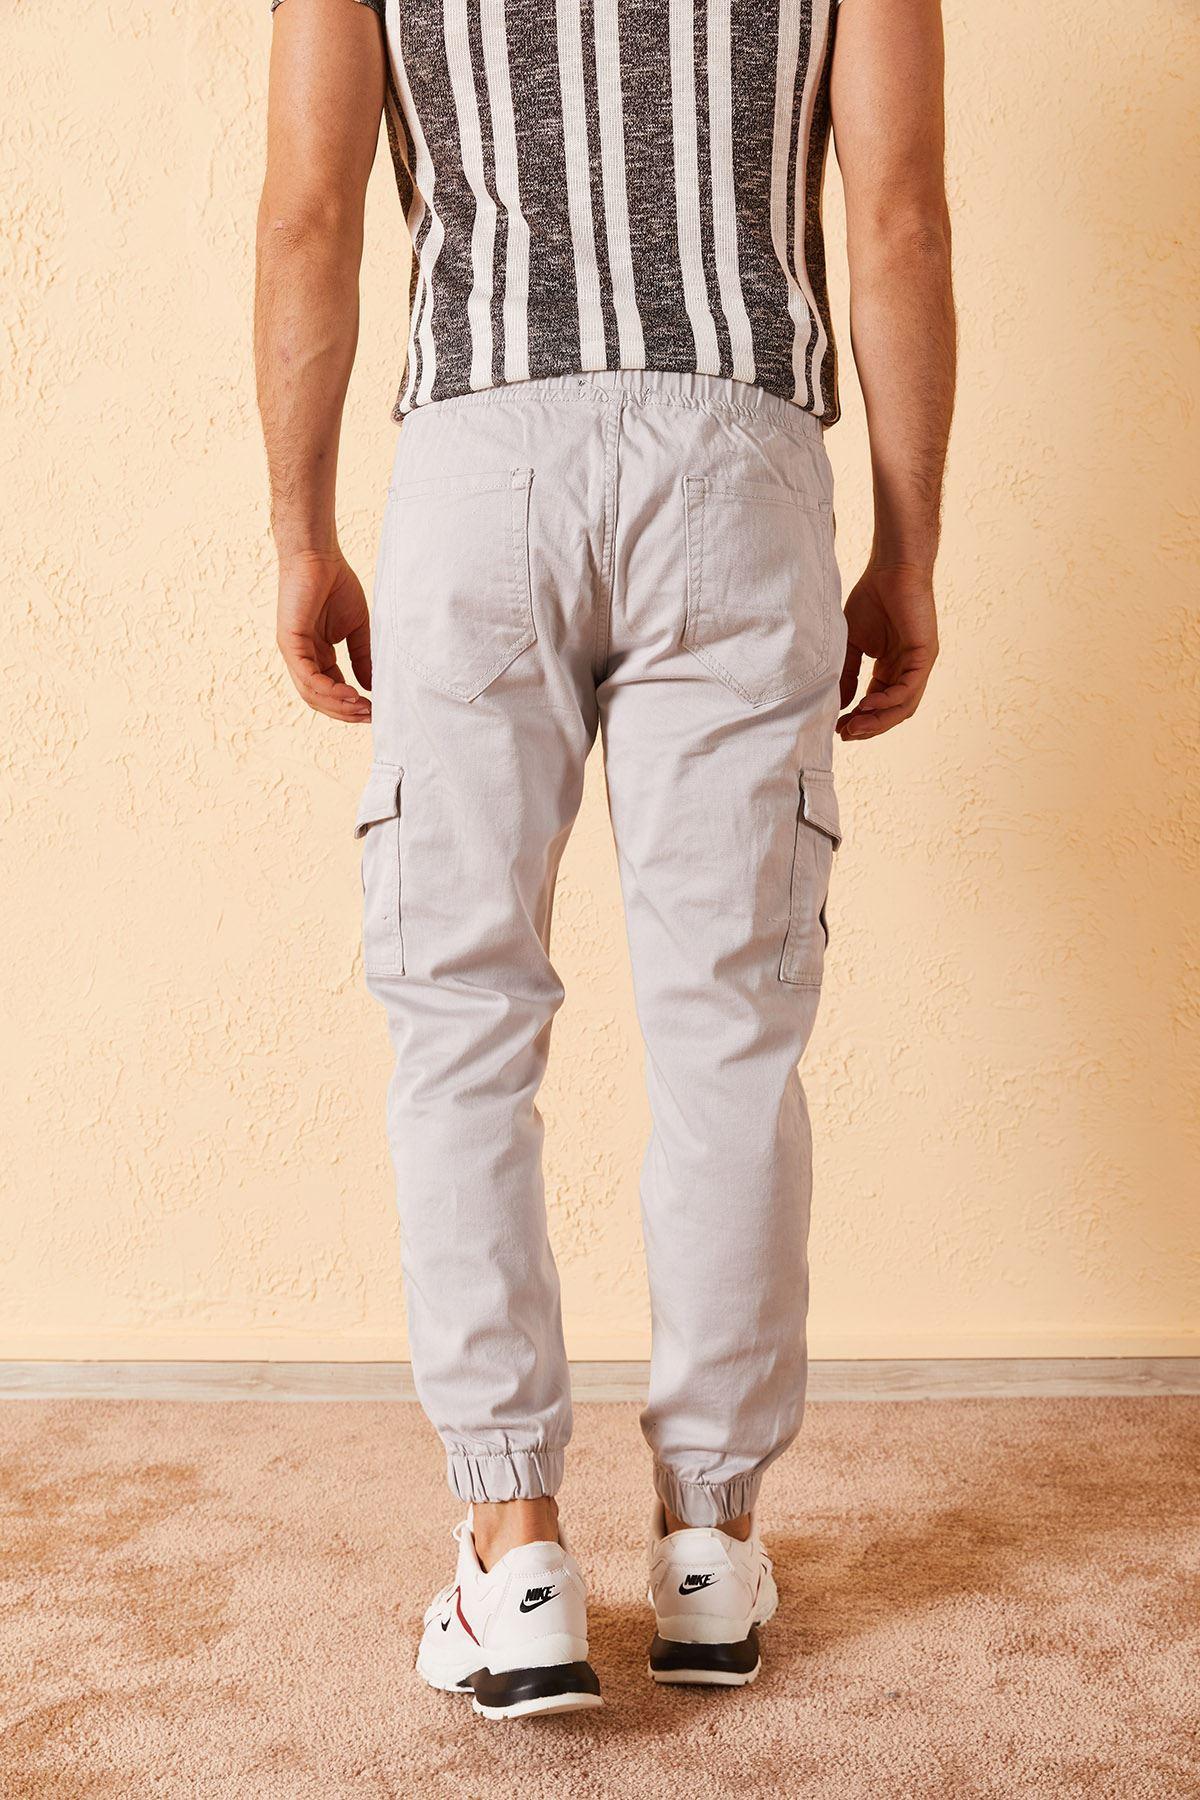 Erkek Paça Lastikli Yan Cepli Pantolon